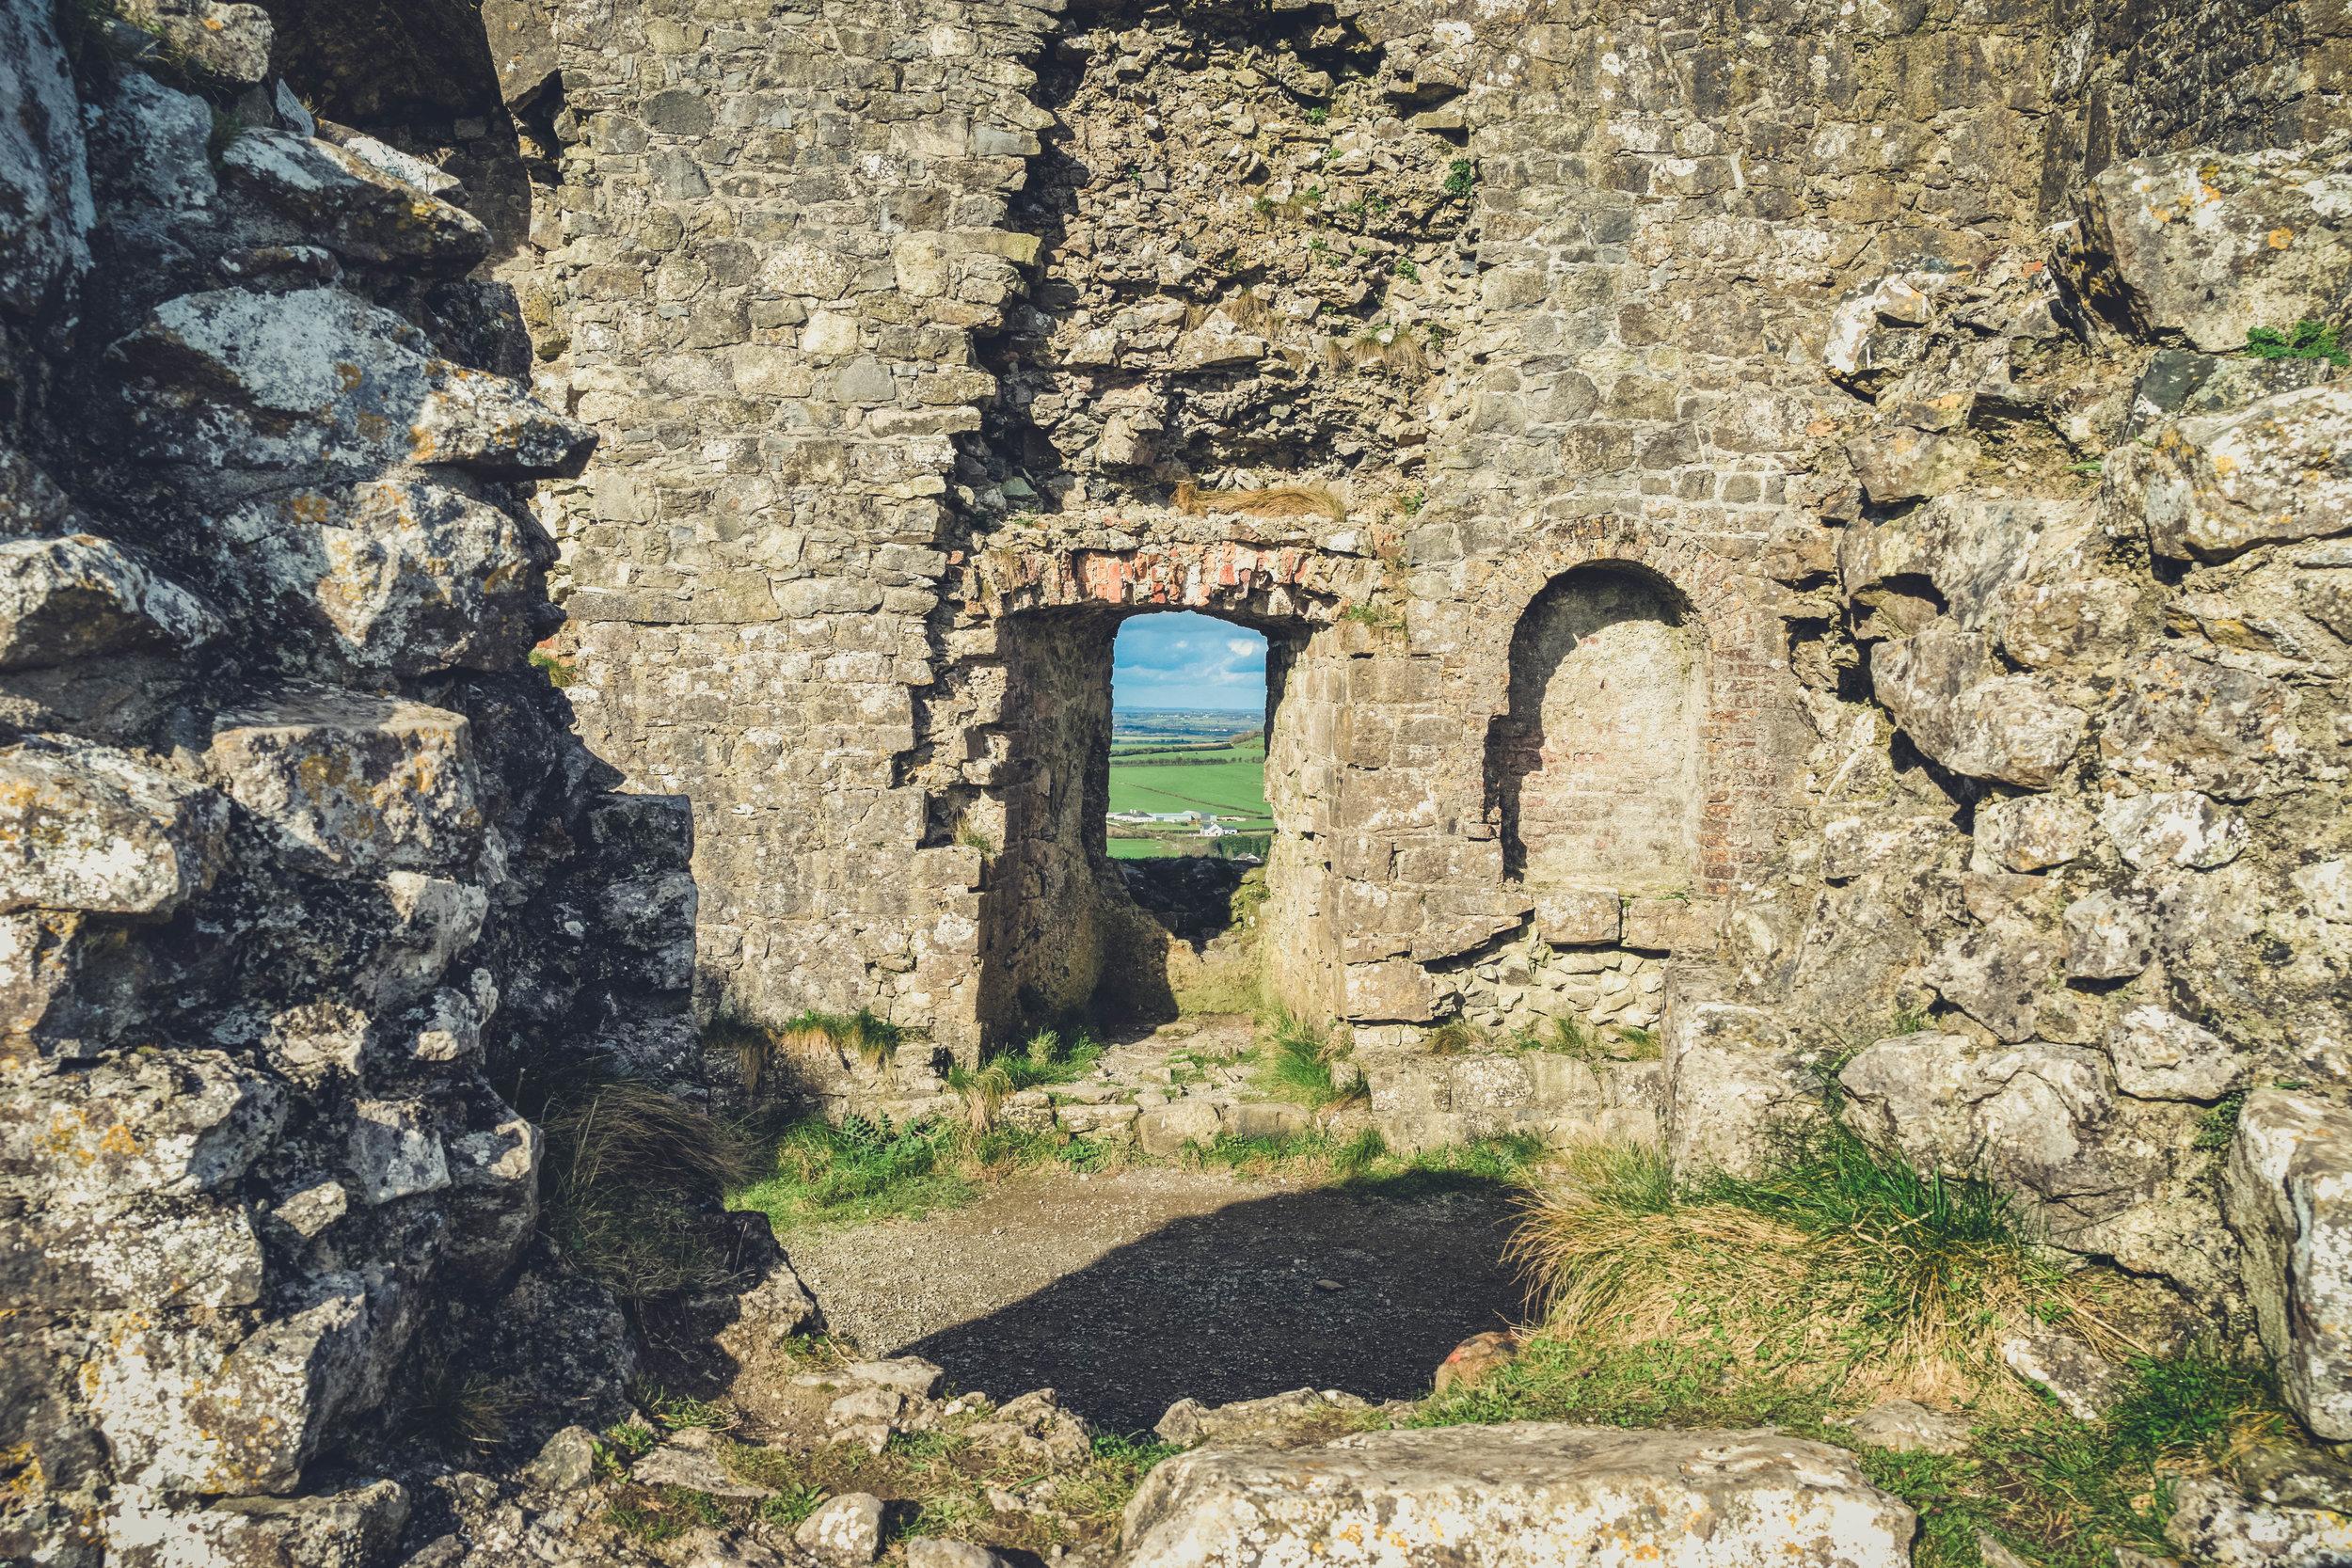 Ireland. Castle. Old castle. irish history. history. Rock of Dunamase. blue sky. rock. pathway. adventure. travel. irish counrty. castle doorway.jpg